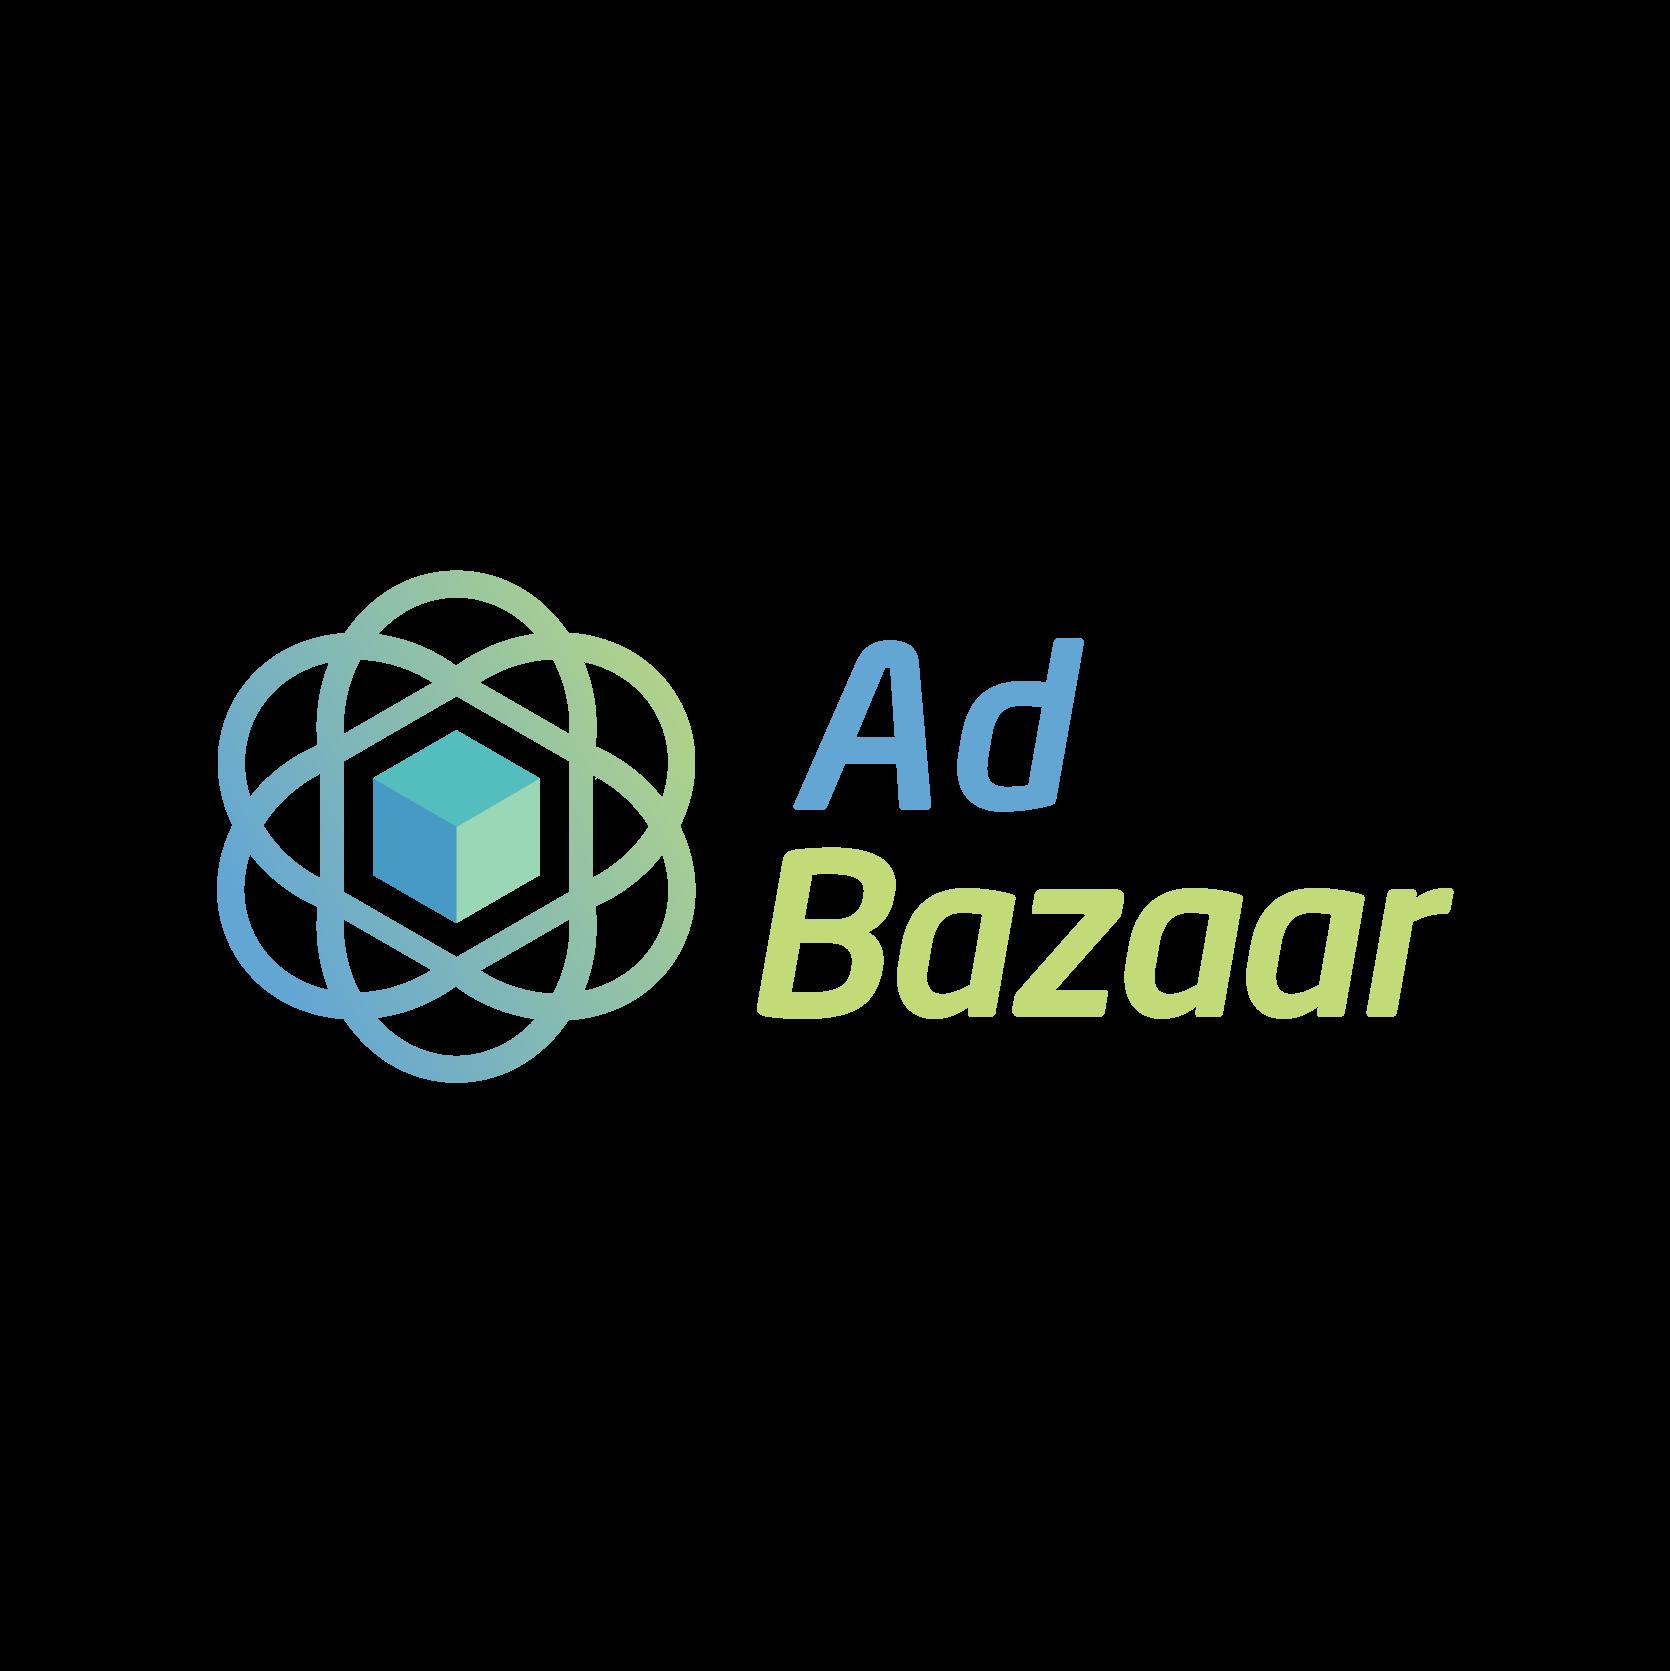 Ad Bazaar